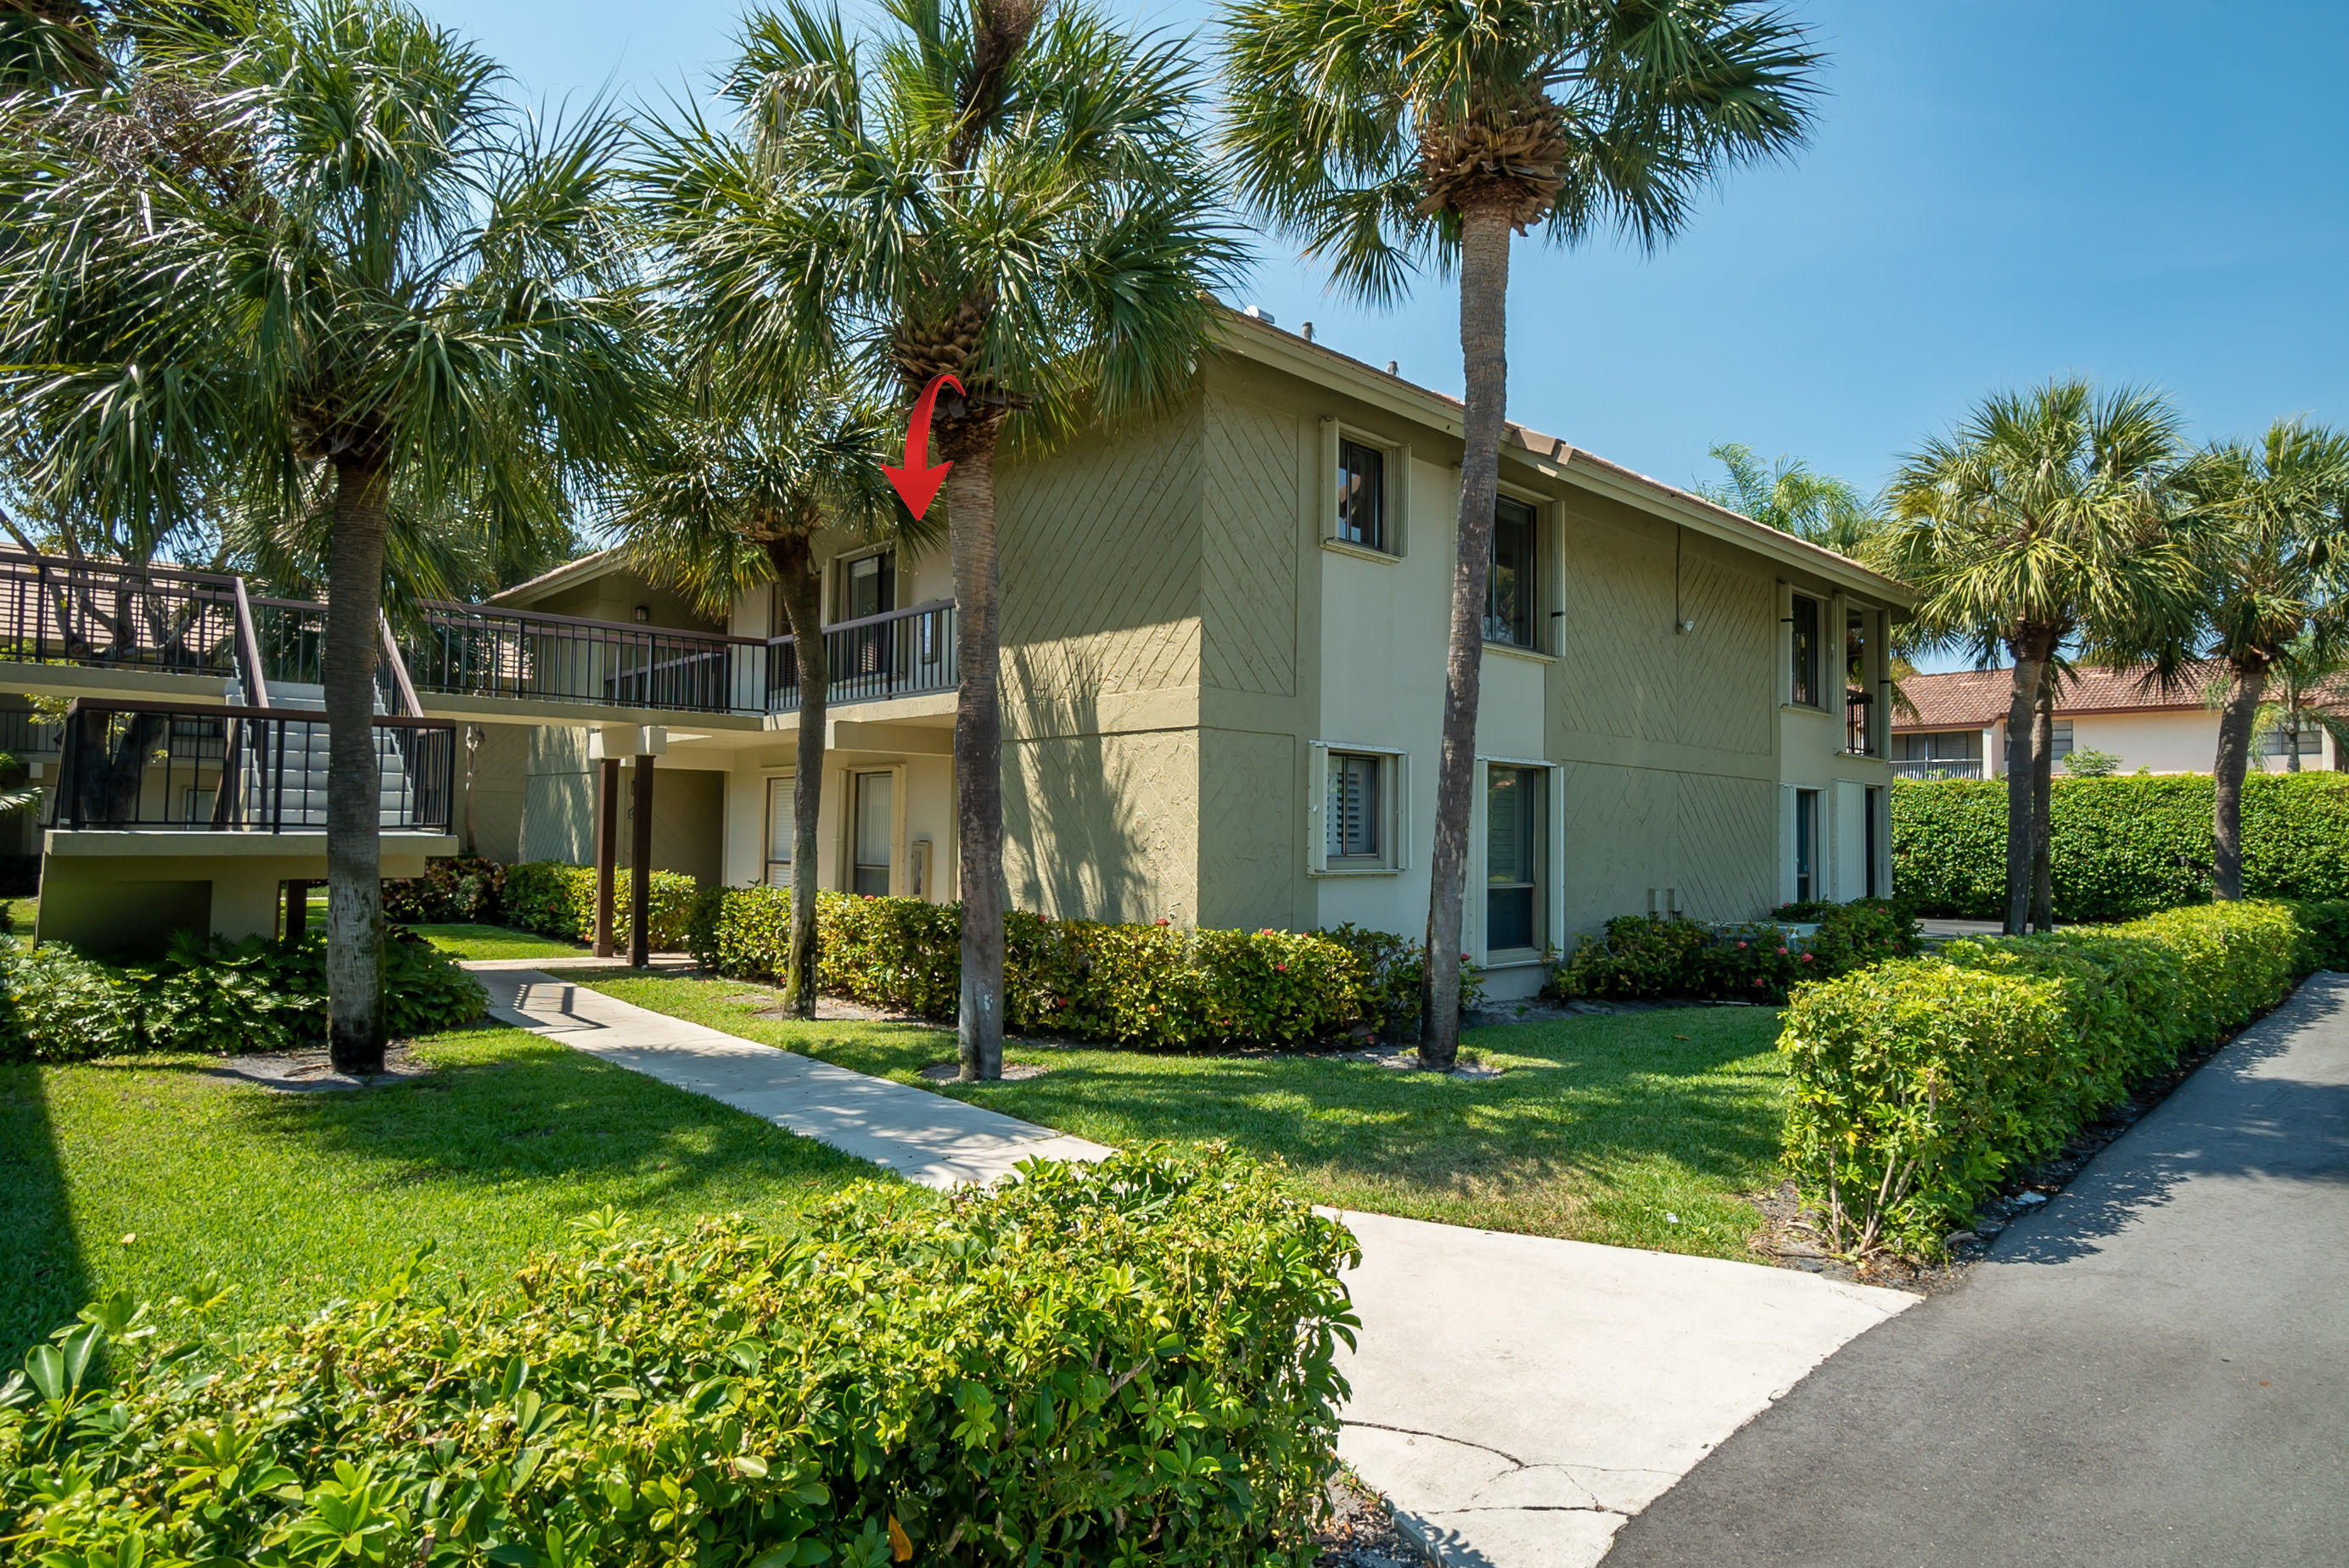 159 NW 70th Street 416  Boca Raton, FL 33487